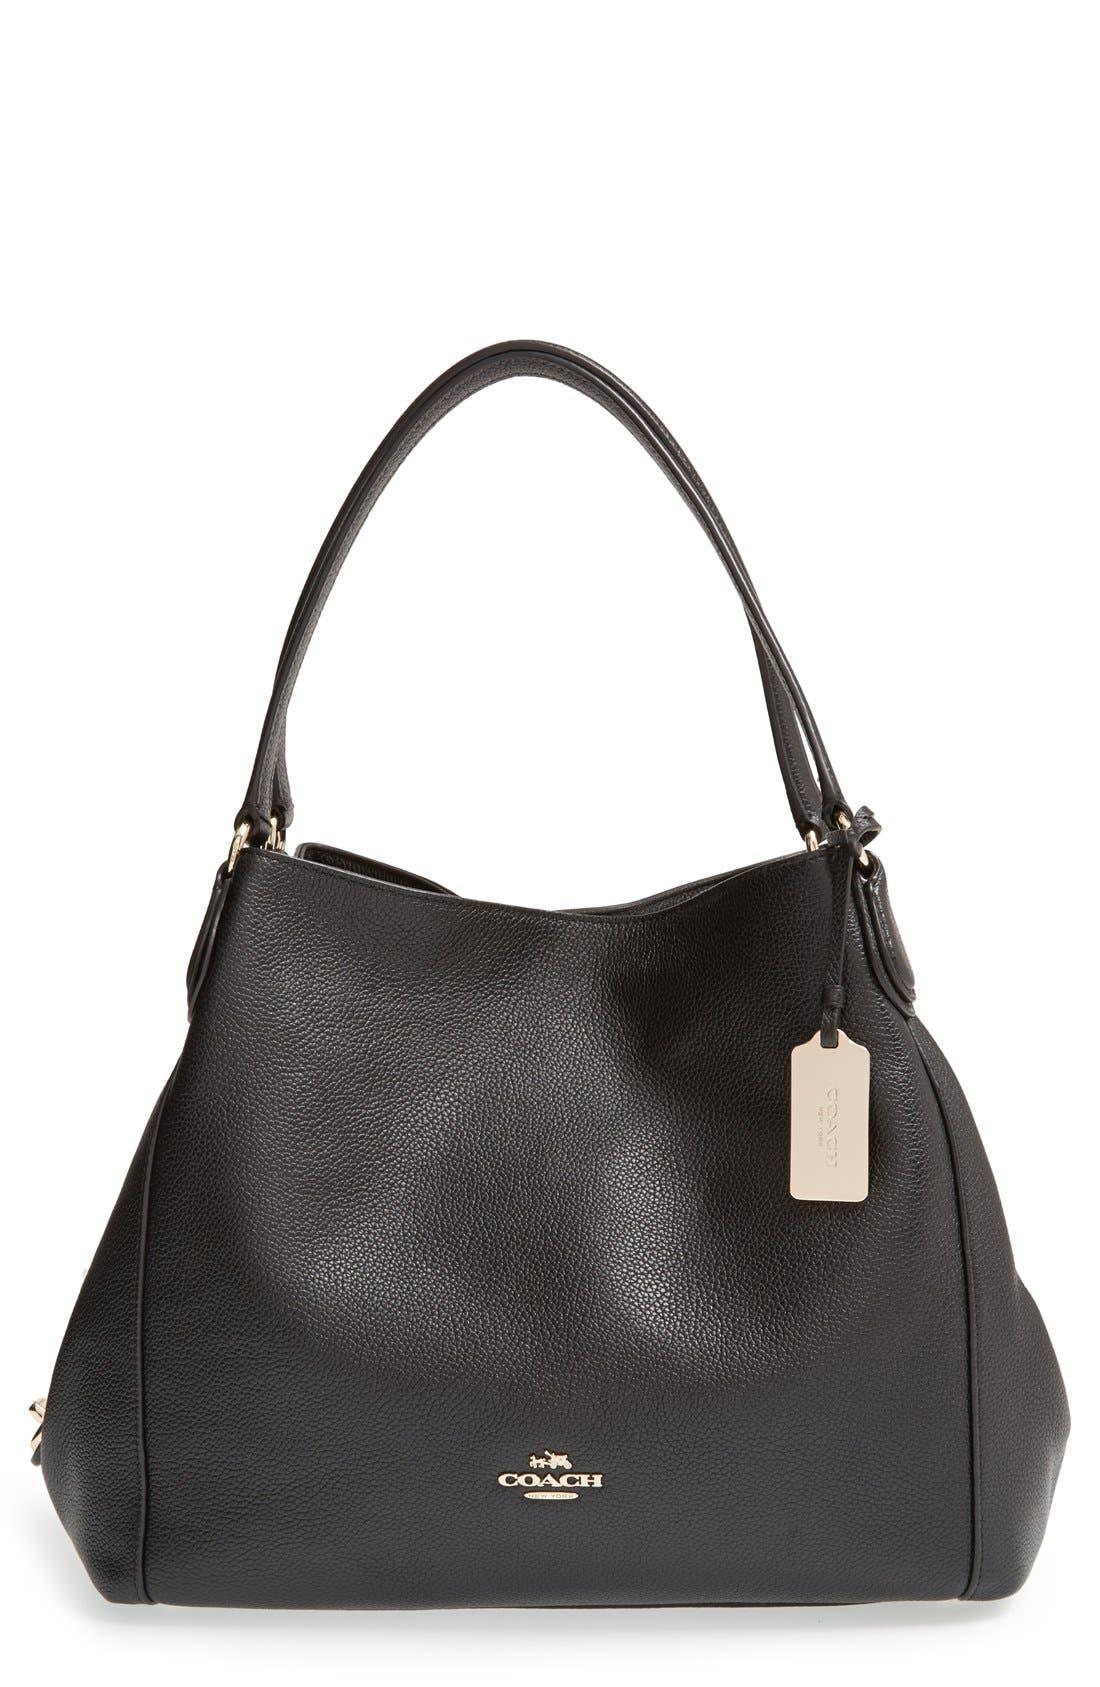 ... Coach Edie Pebbled Leather Shoulder Bag Nordstrom ... 39c0bdea42a57